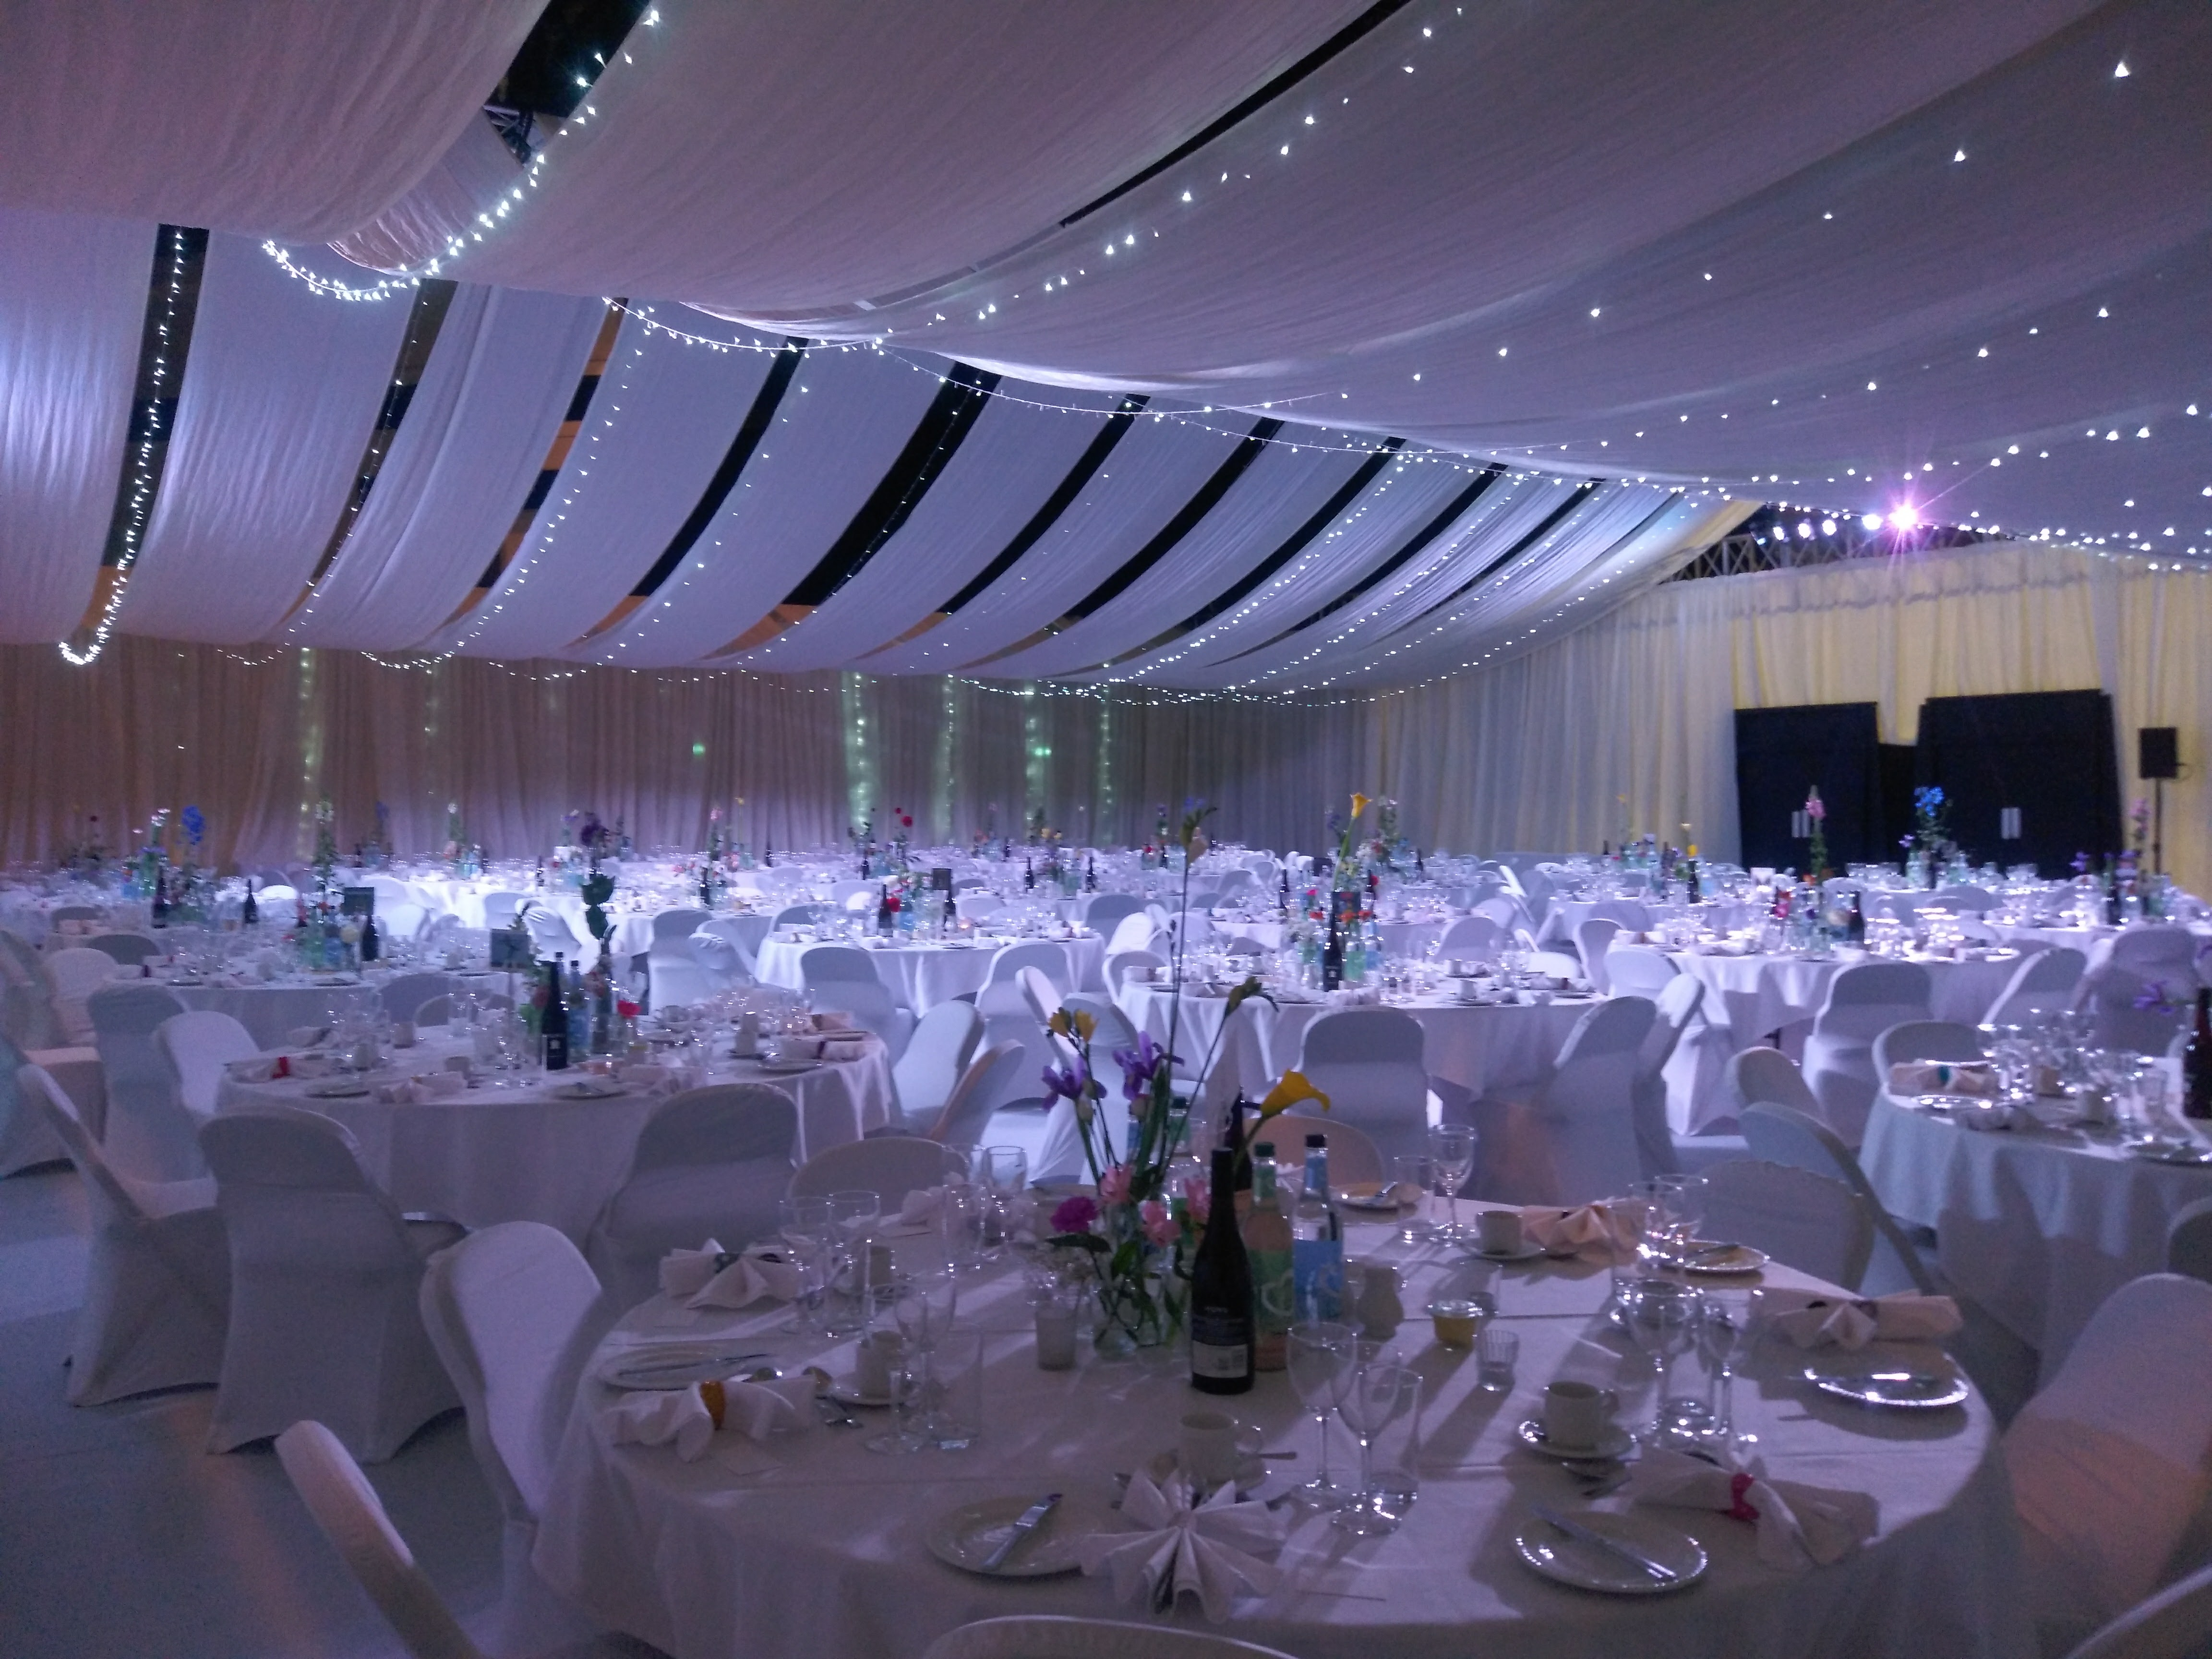 Wedding Draping & Lighting